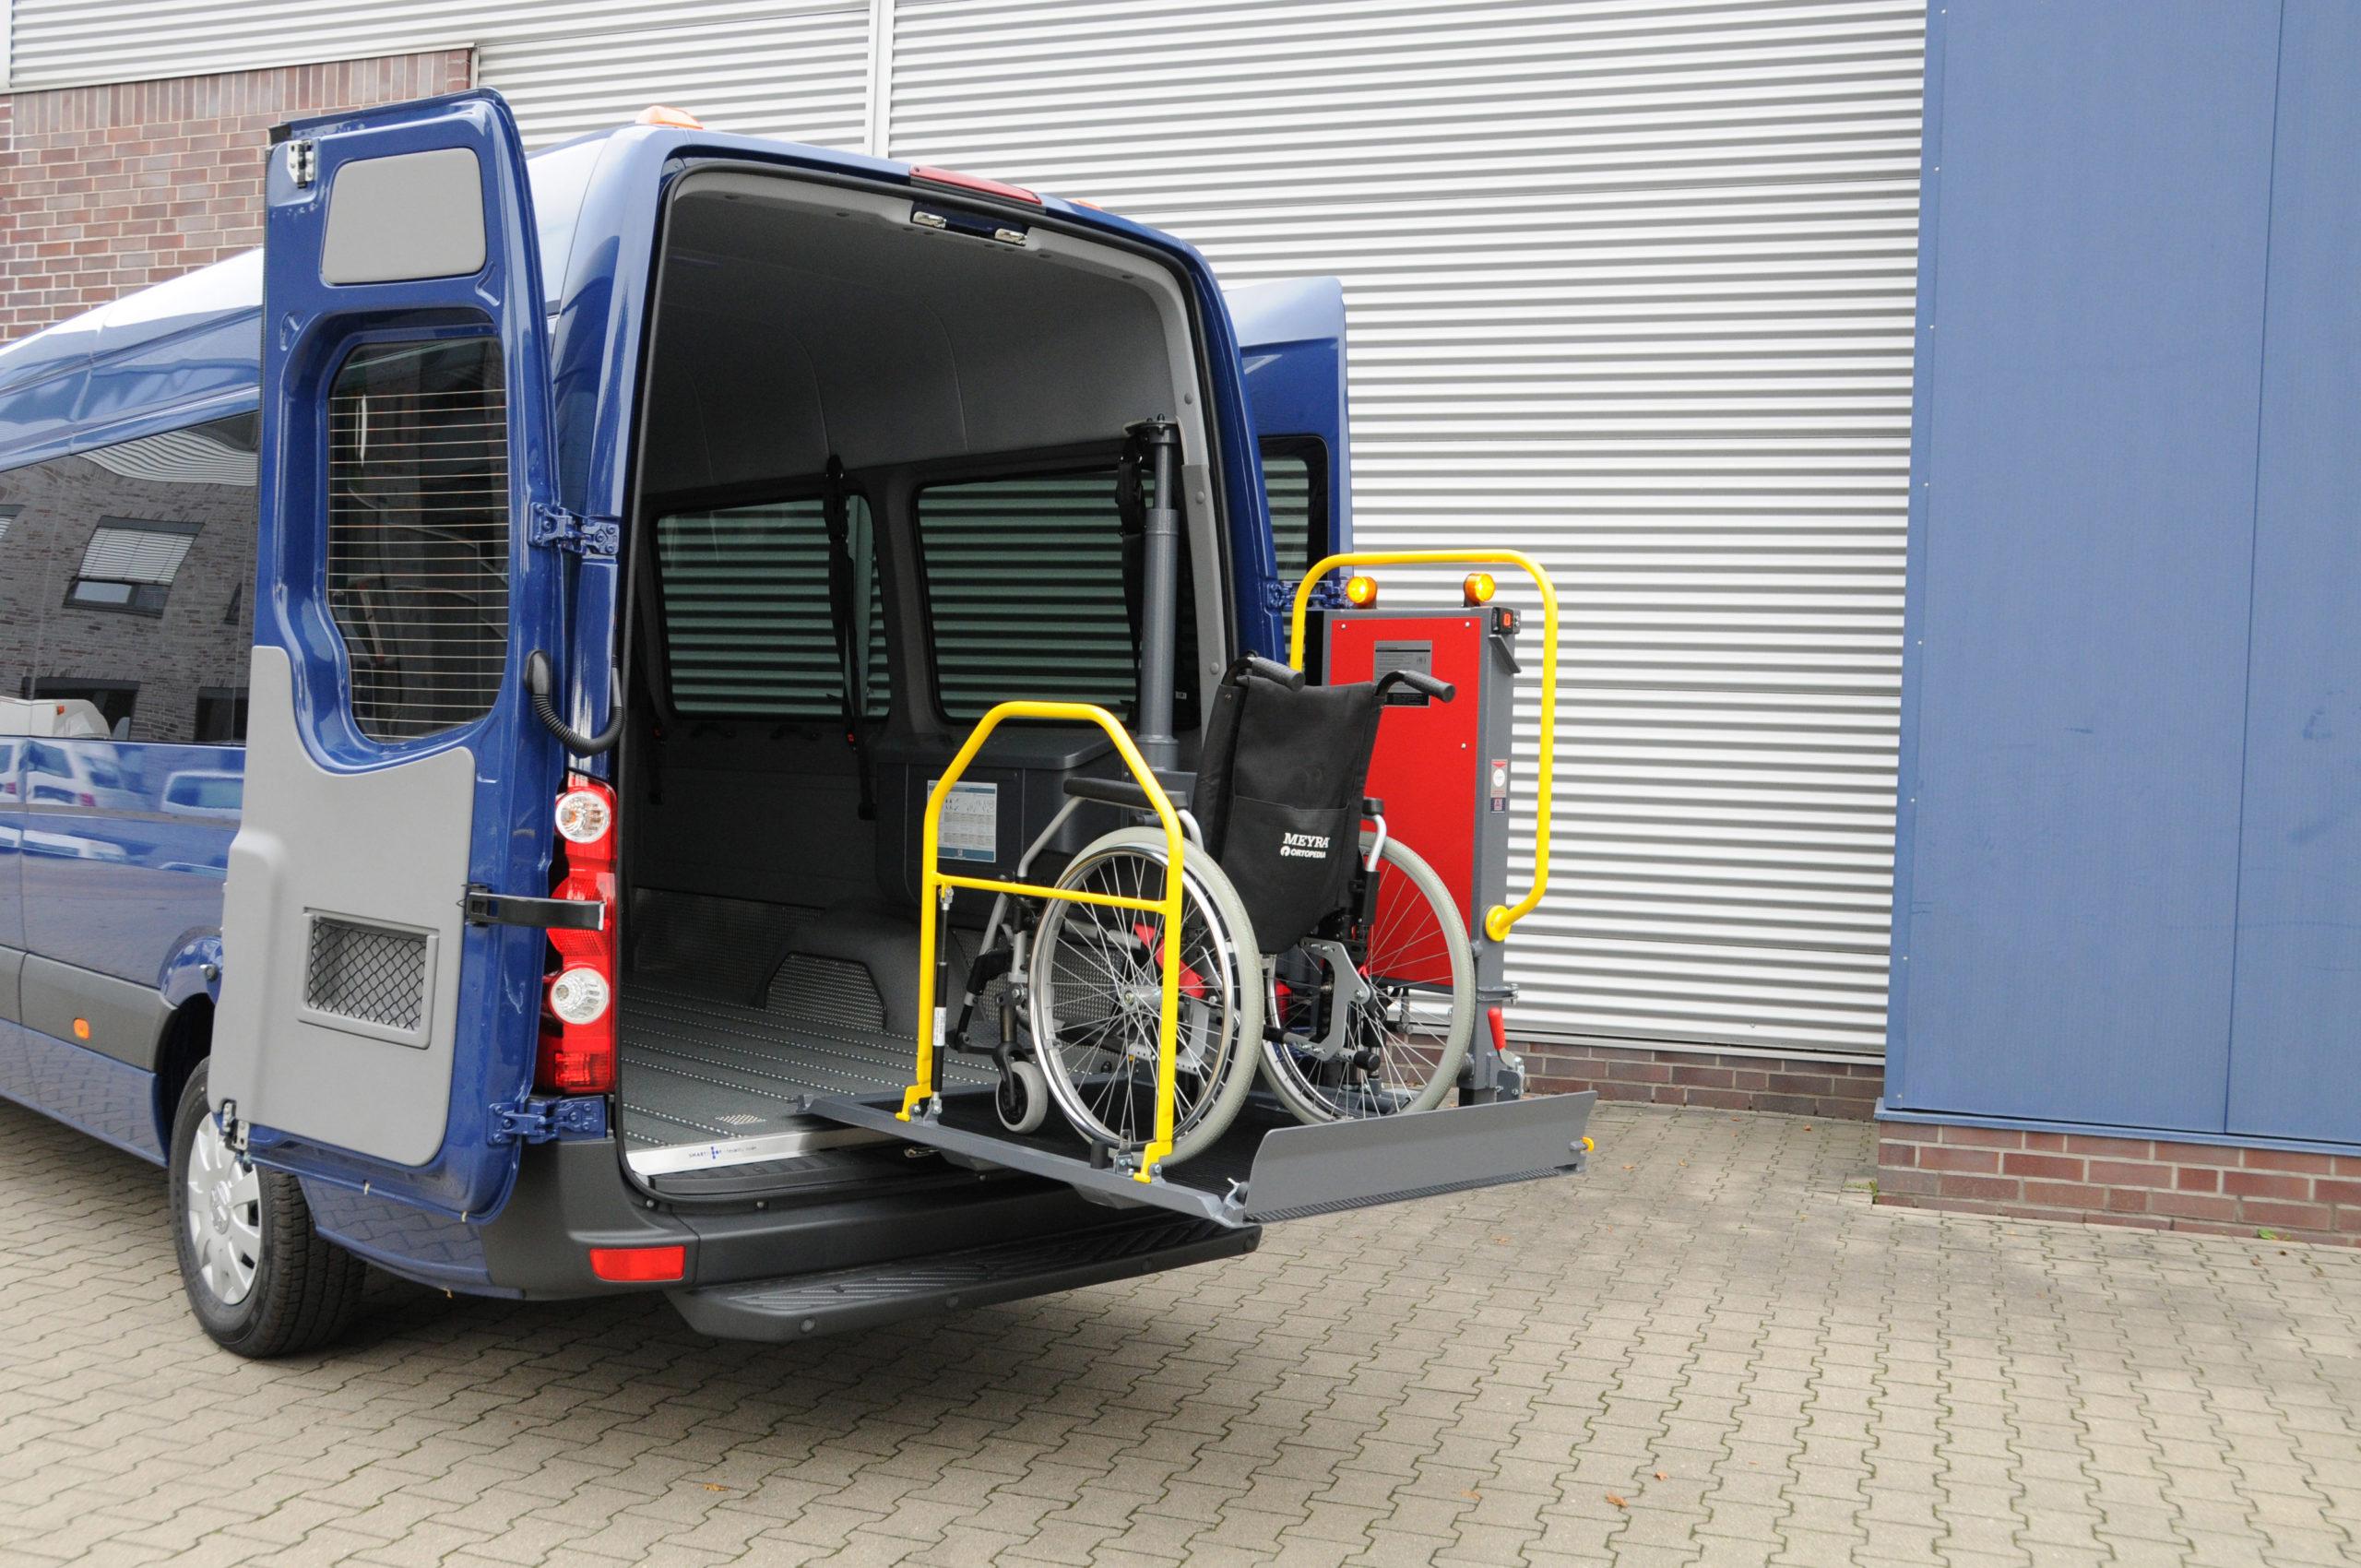 AMF-Bruns_VW Crafter_BSL350 (6)